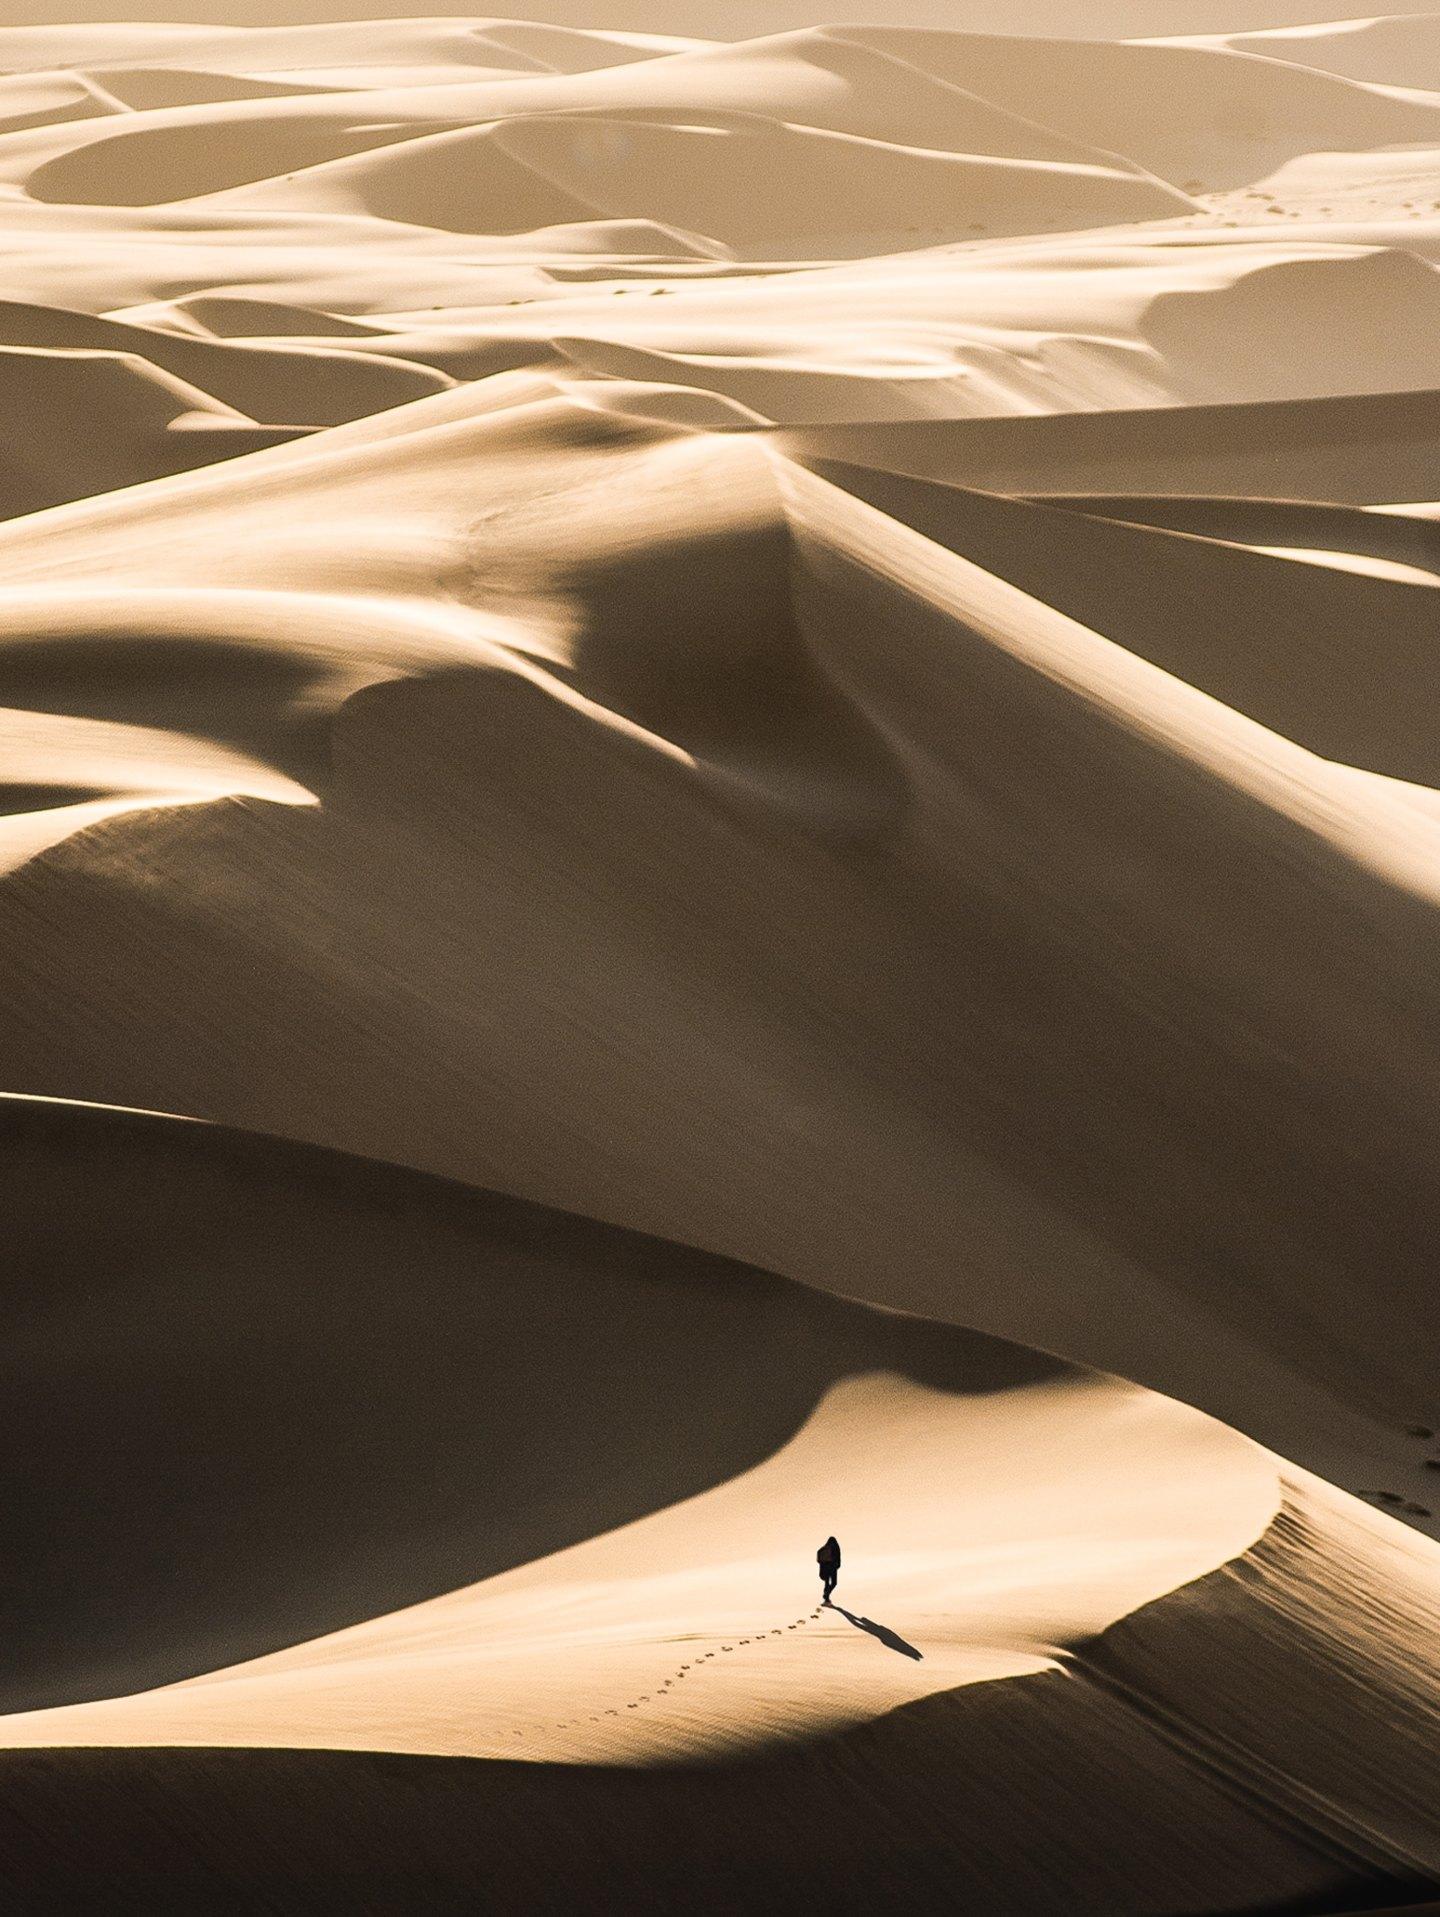 Person walking along through the desert